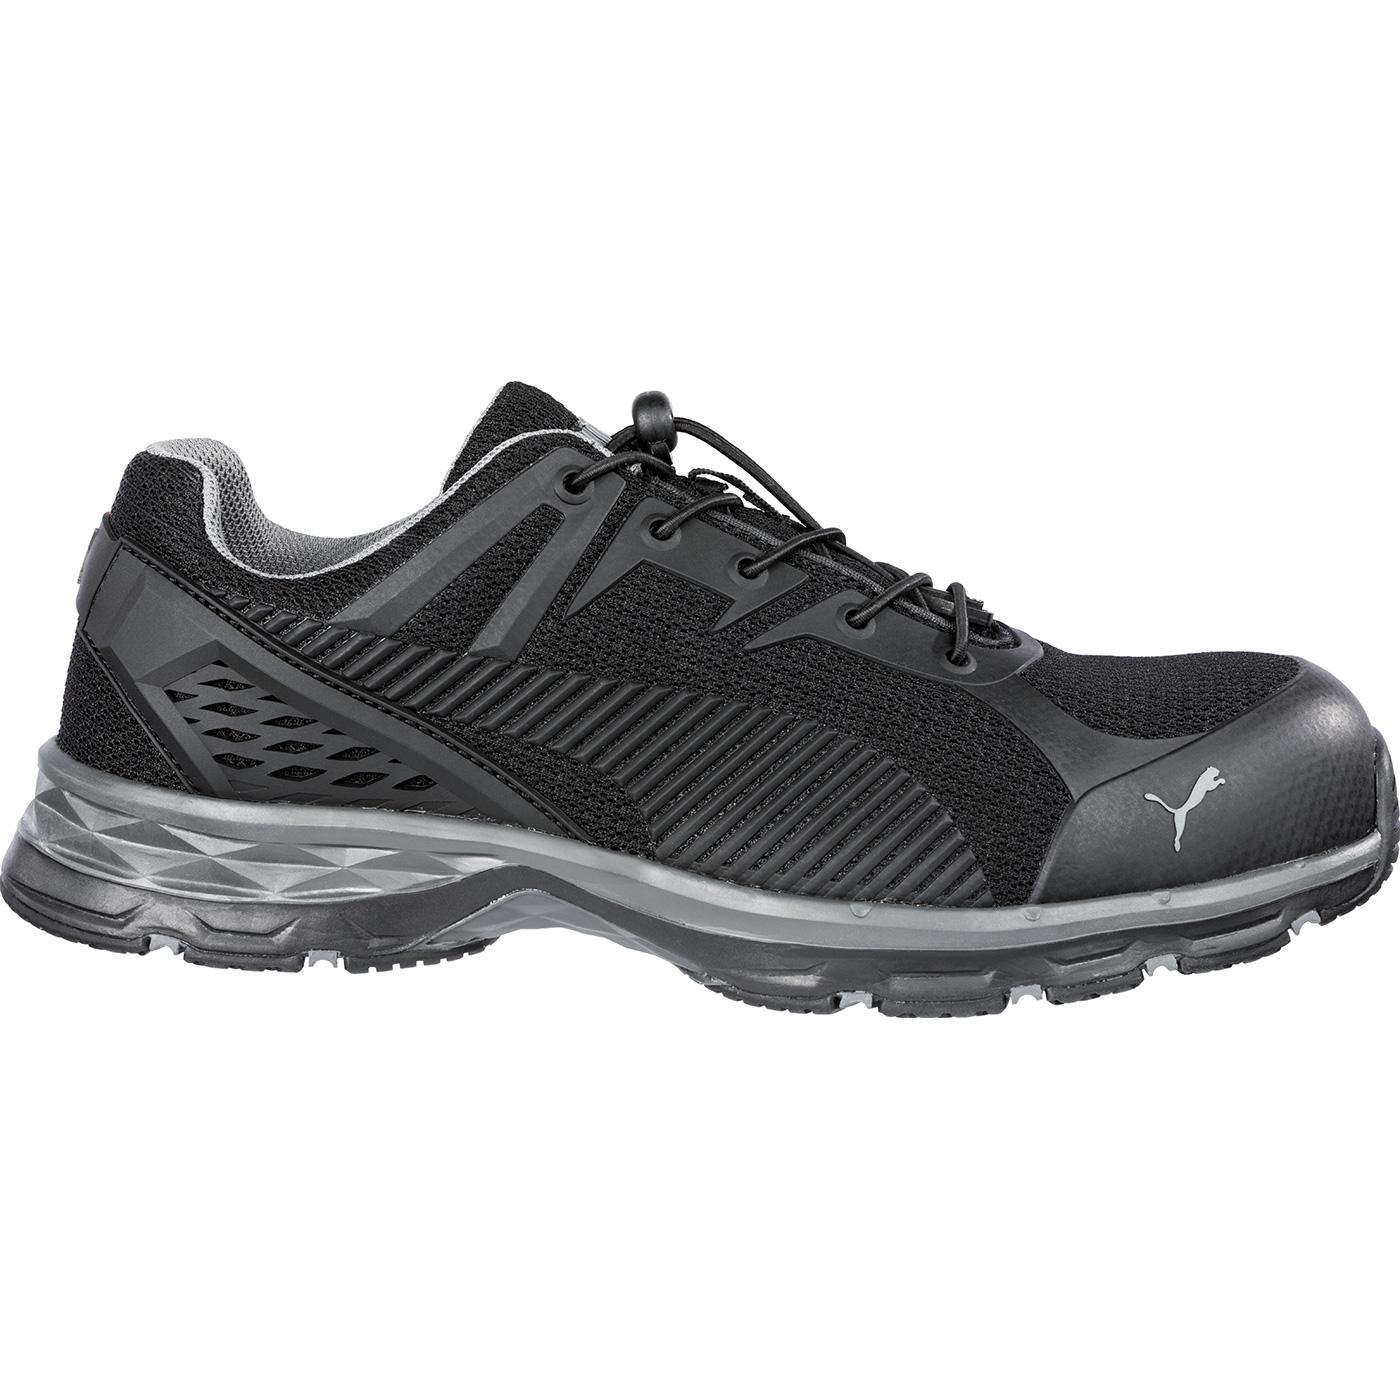 8d795bc0323d Puma Fuse Motion 2.0 Low Men s Composite Toe Static Dissipative Athletic  Work ShoePuma Fuse Motion 2.0 Low Men s Composite Toe Static Dissipative  Athletic ...